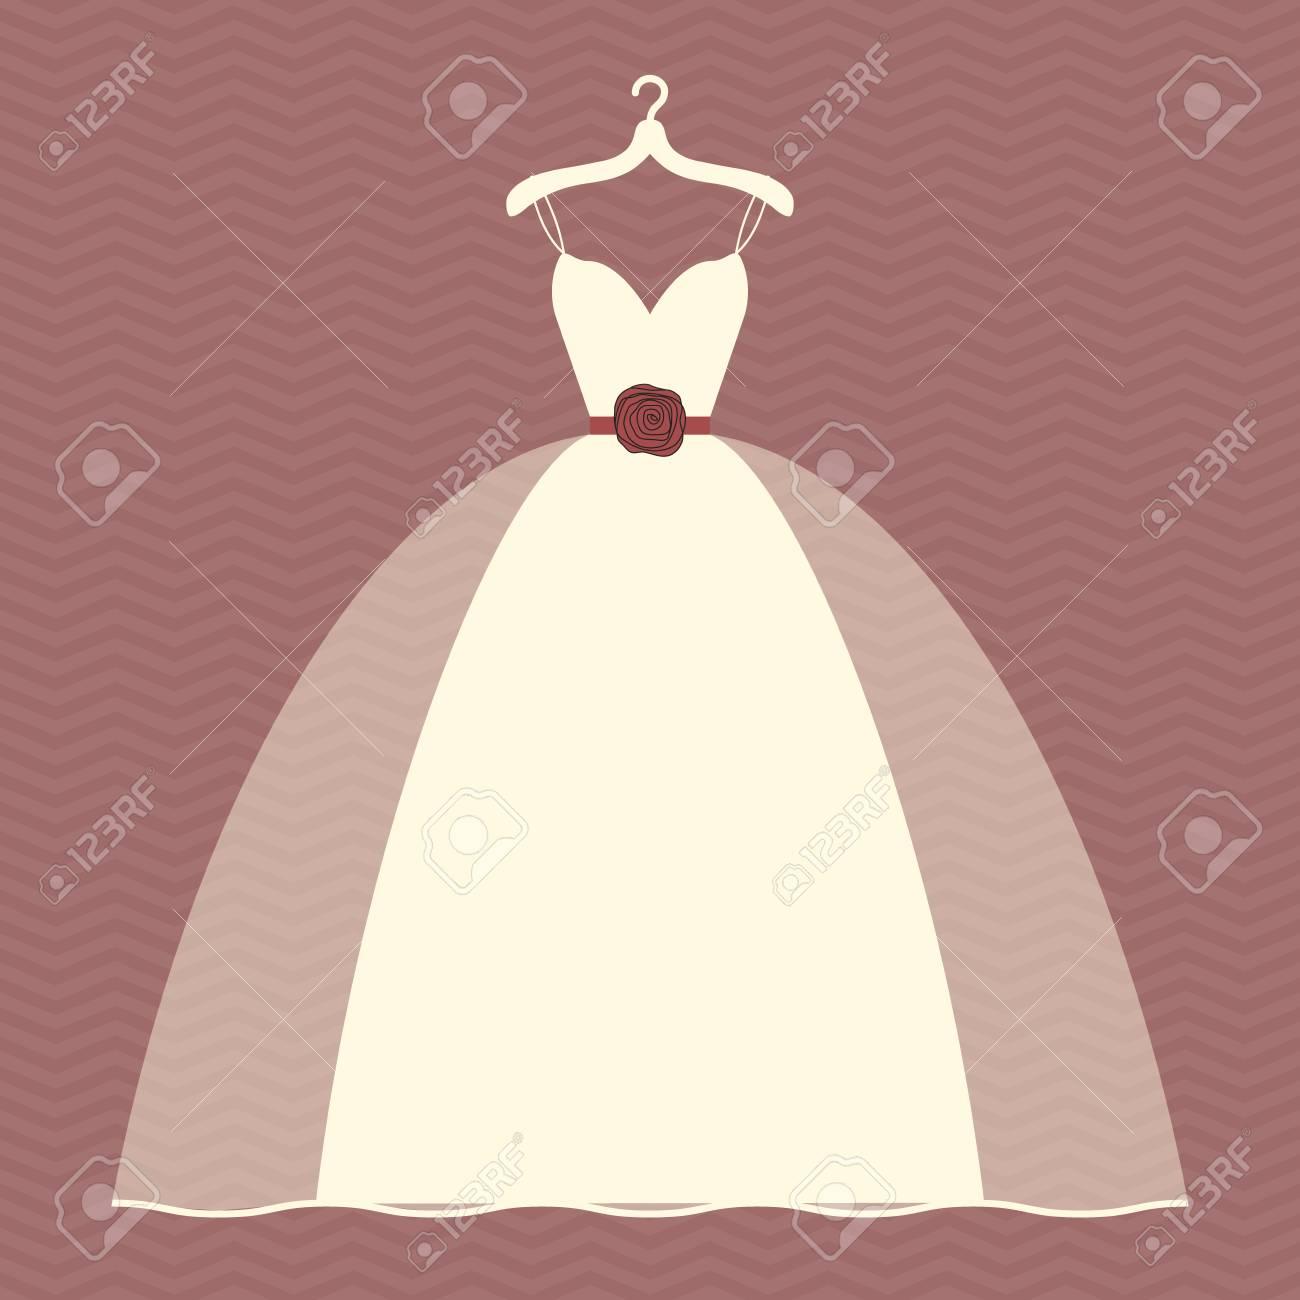 wedding invitation card bridal shower bachelorette party hen do invite editable background